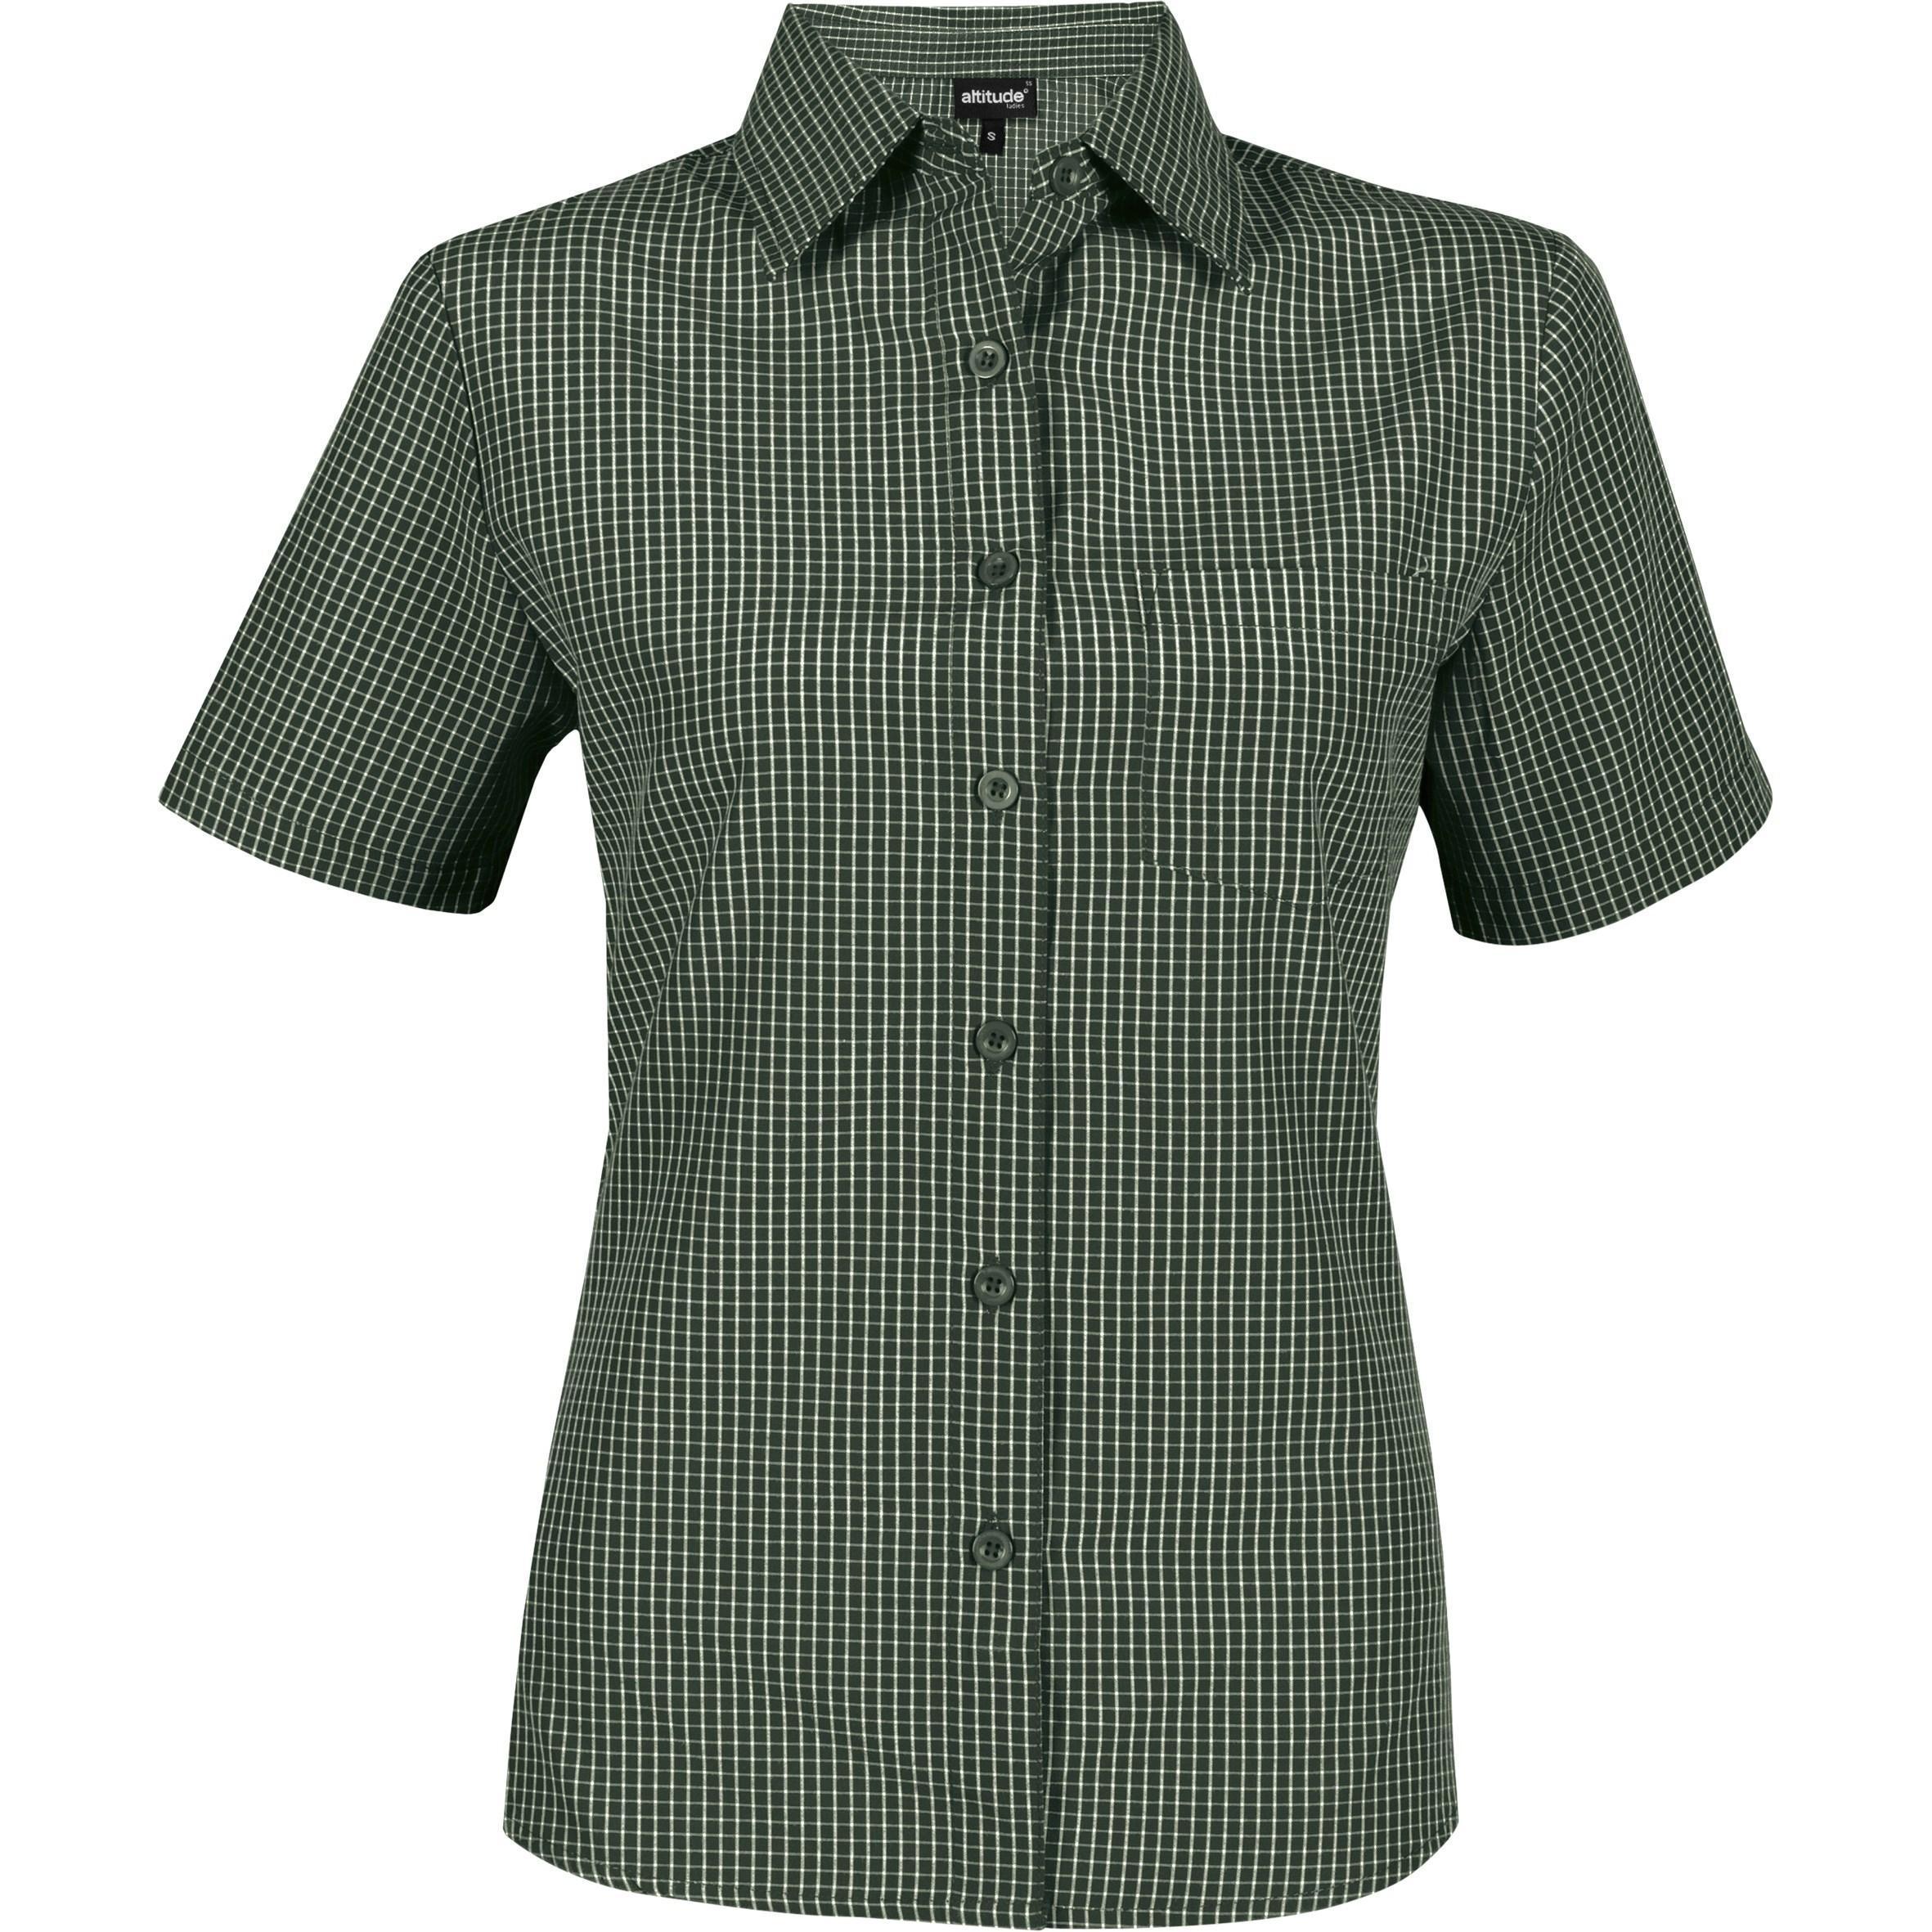 Ladies Short Sleeve Cedar Shirt - Green Only